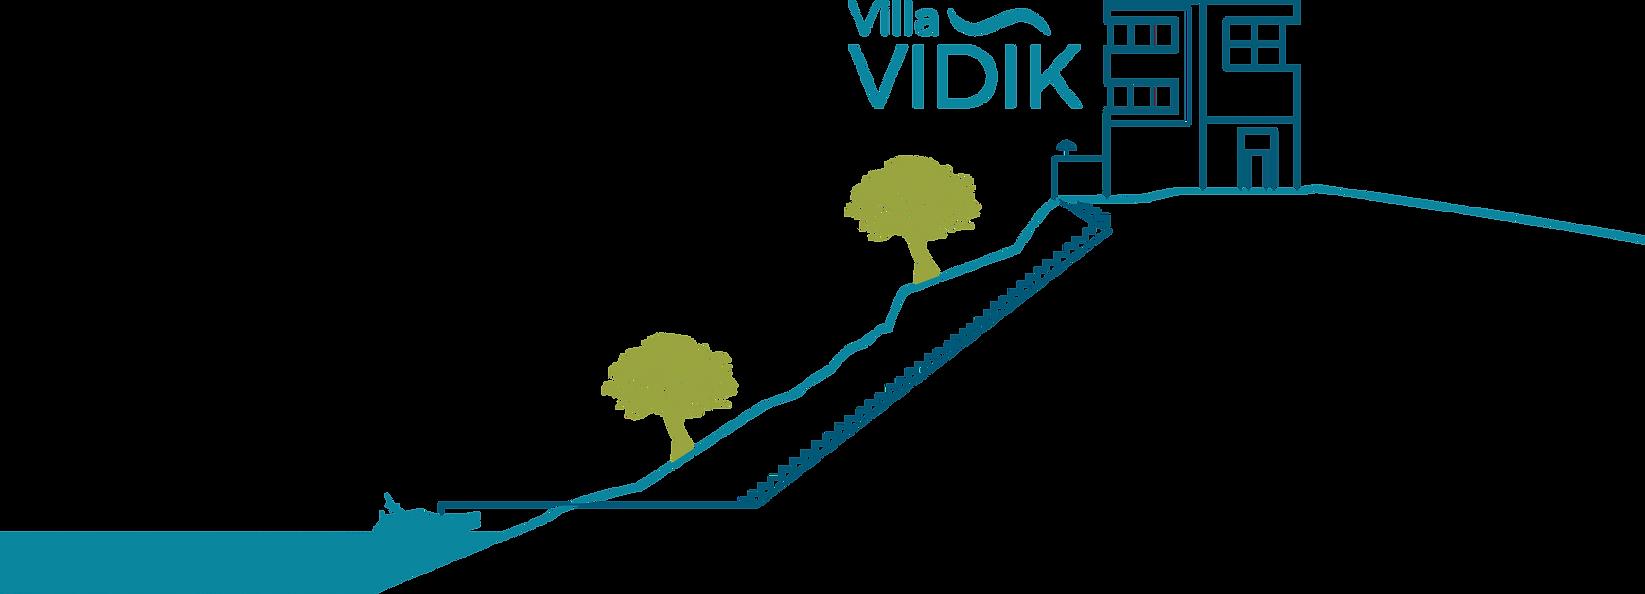 Ilustration of Villa Vidik